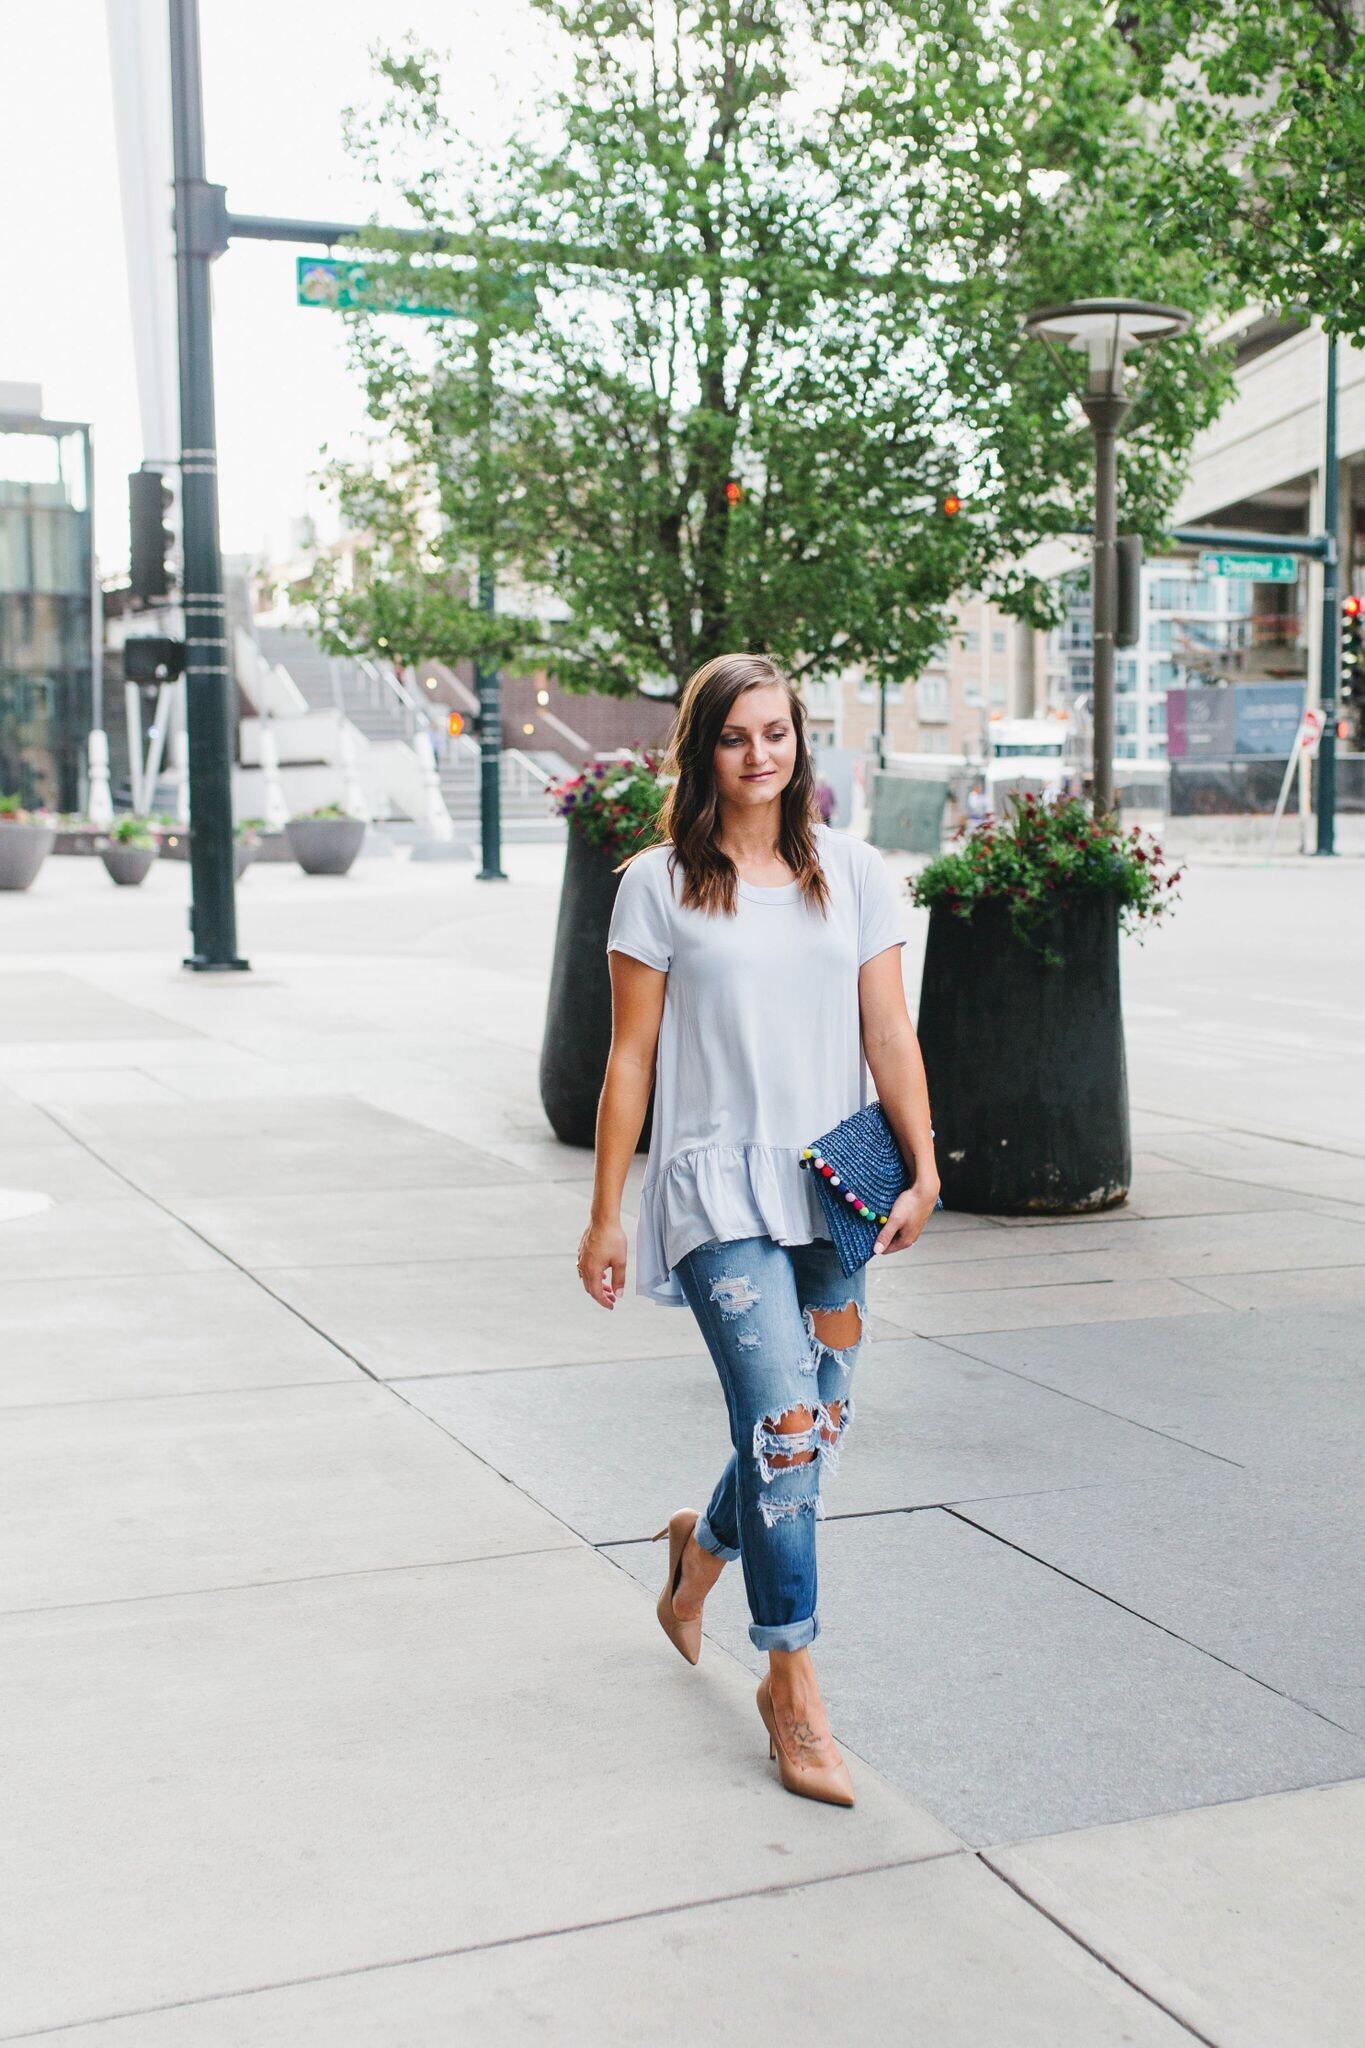 "<img src =""how-to-wear-boyfriend-jeans.jpg"" alt = ""fashion-blogger-of-teddybearsandlipstick-walkng-the-streets-of-downtown-denver-wearing-sam-edelman-hazel-pumps-boyfriend-jeans-and-a-flowy-peplum-top"">"